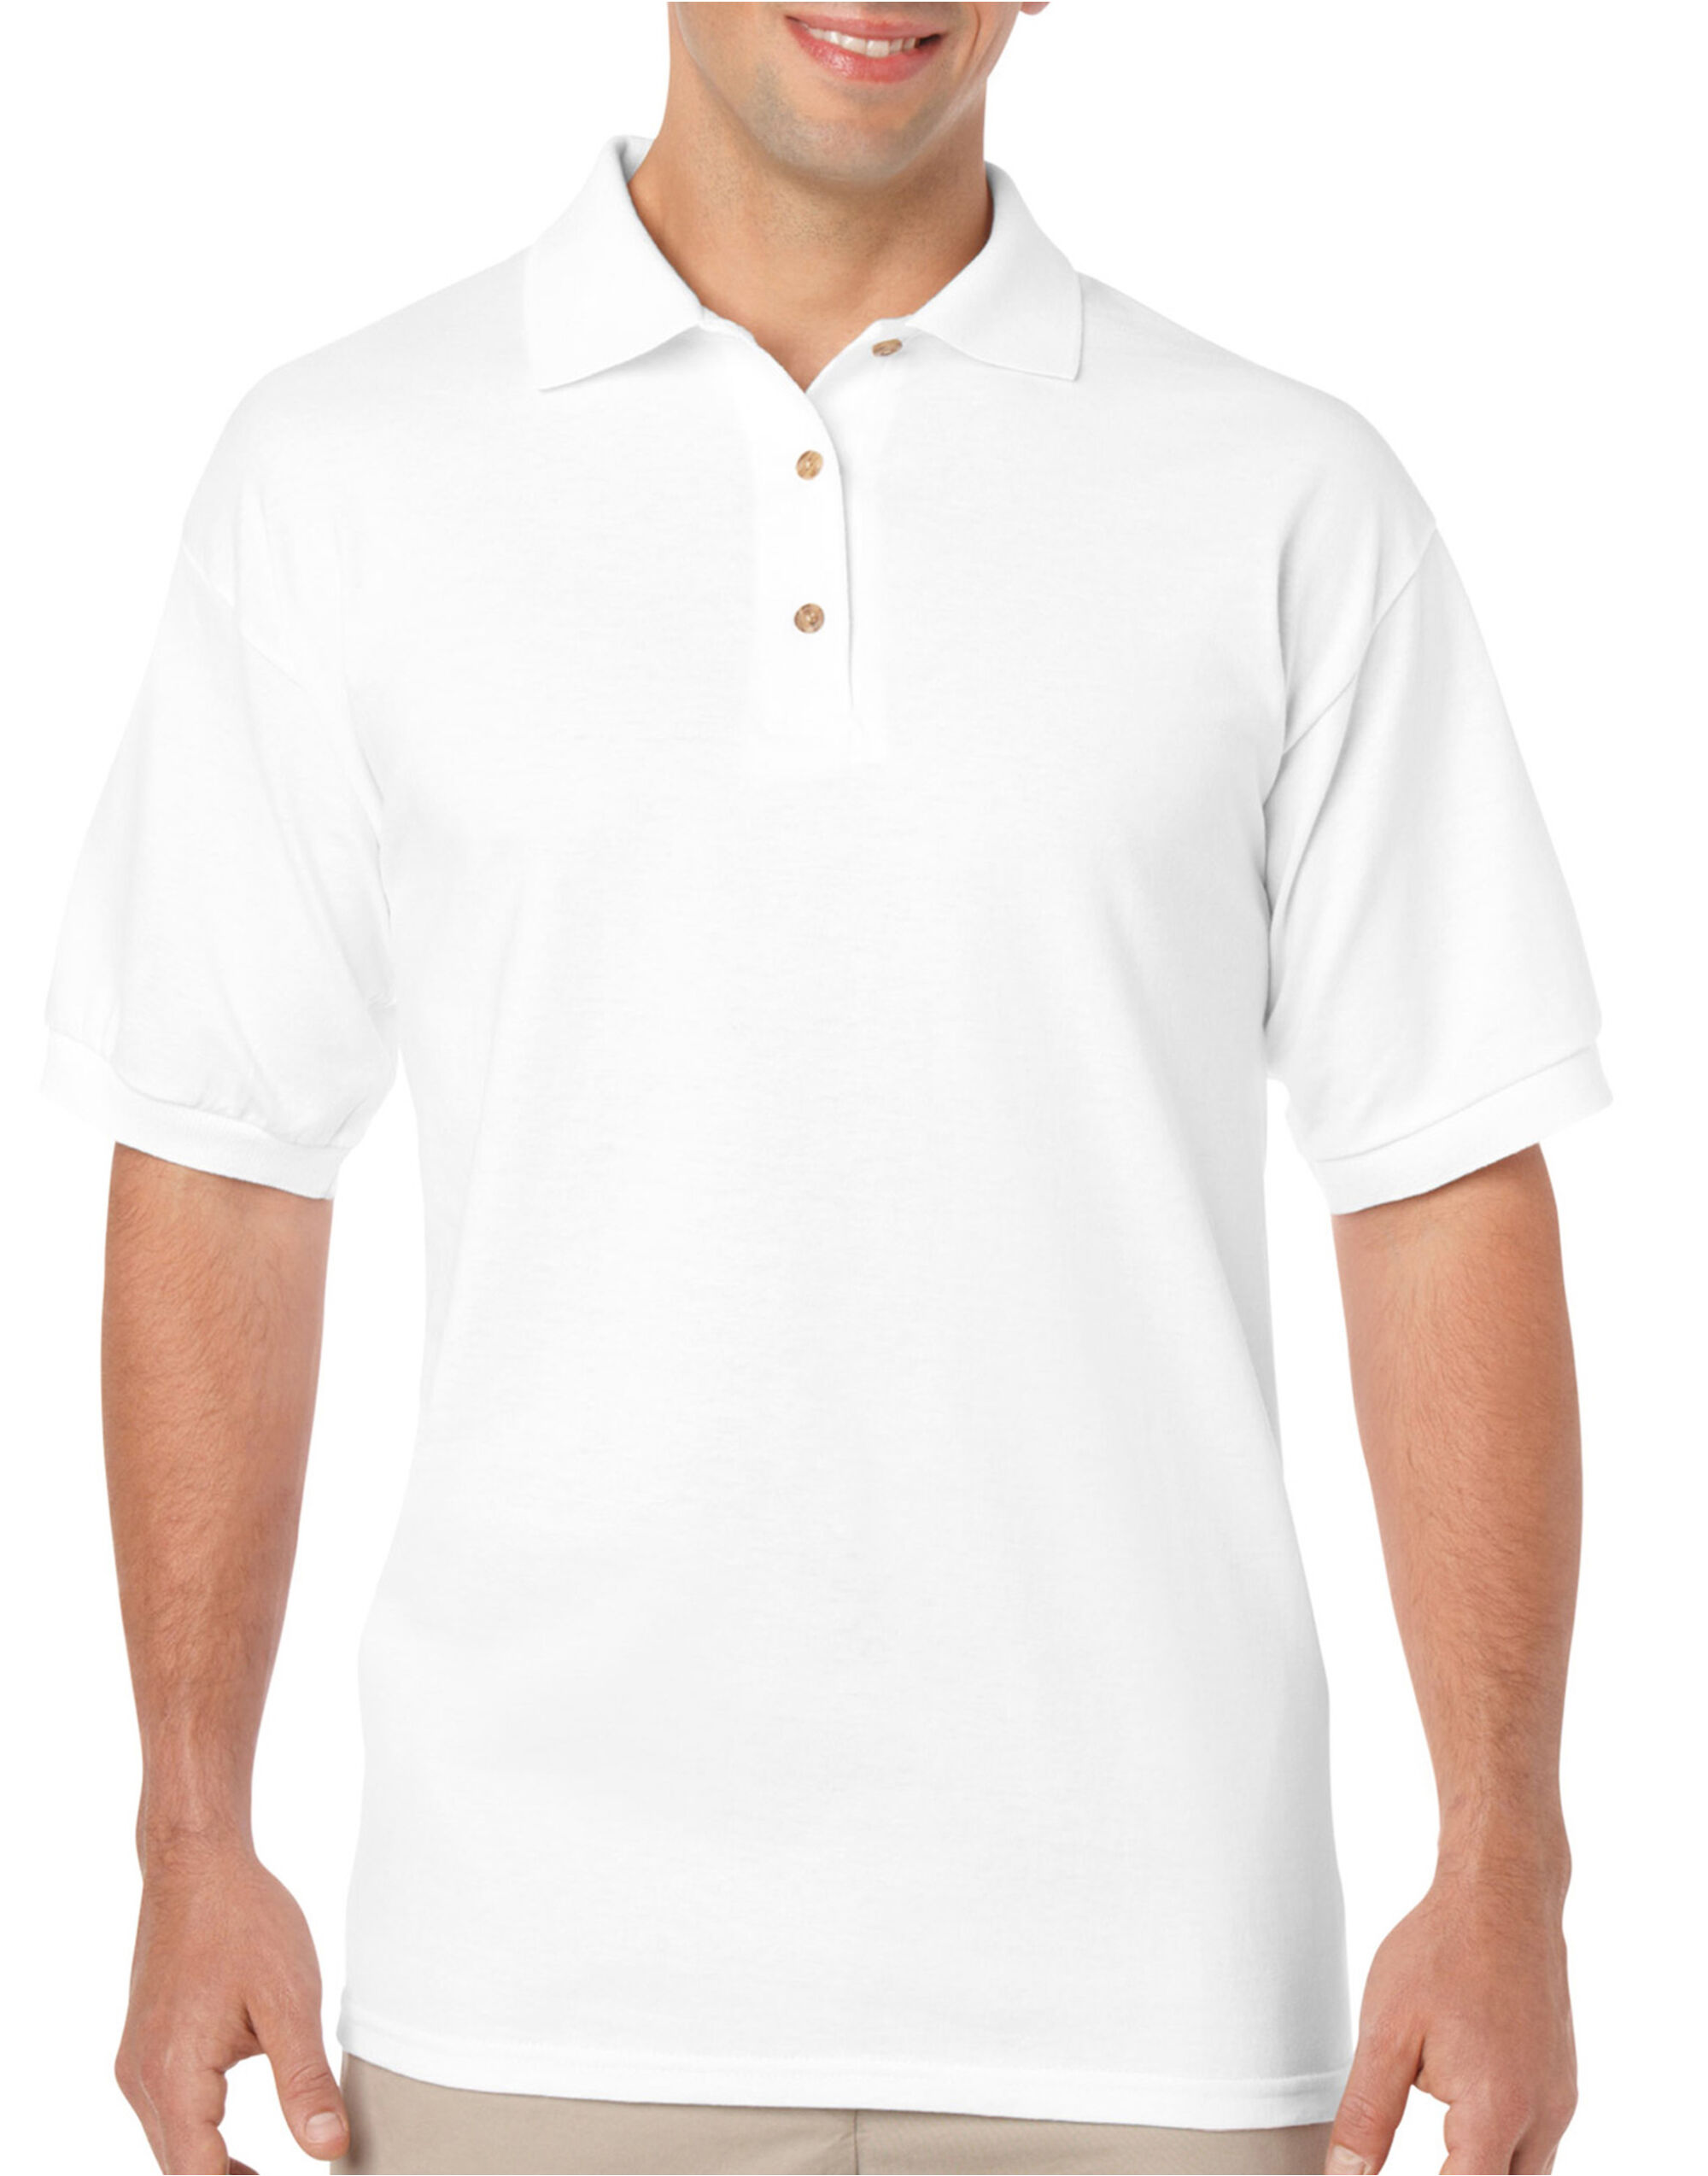 Adult DryBlend Jersey Polo